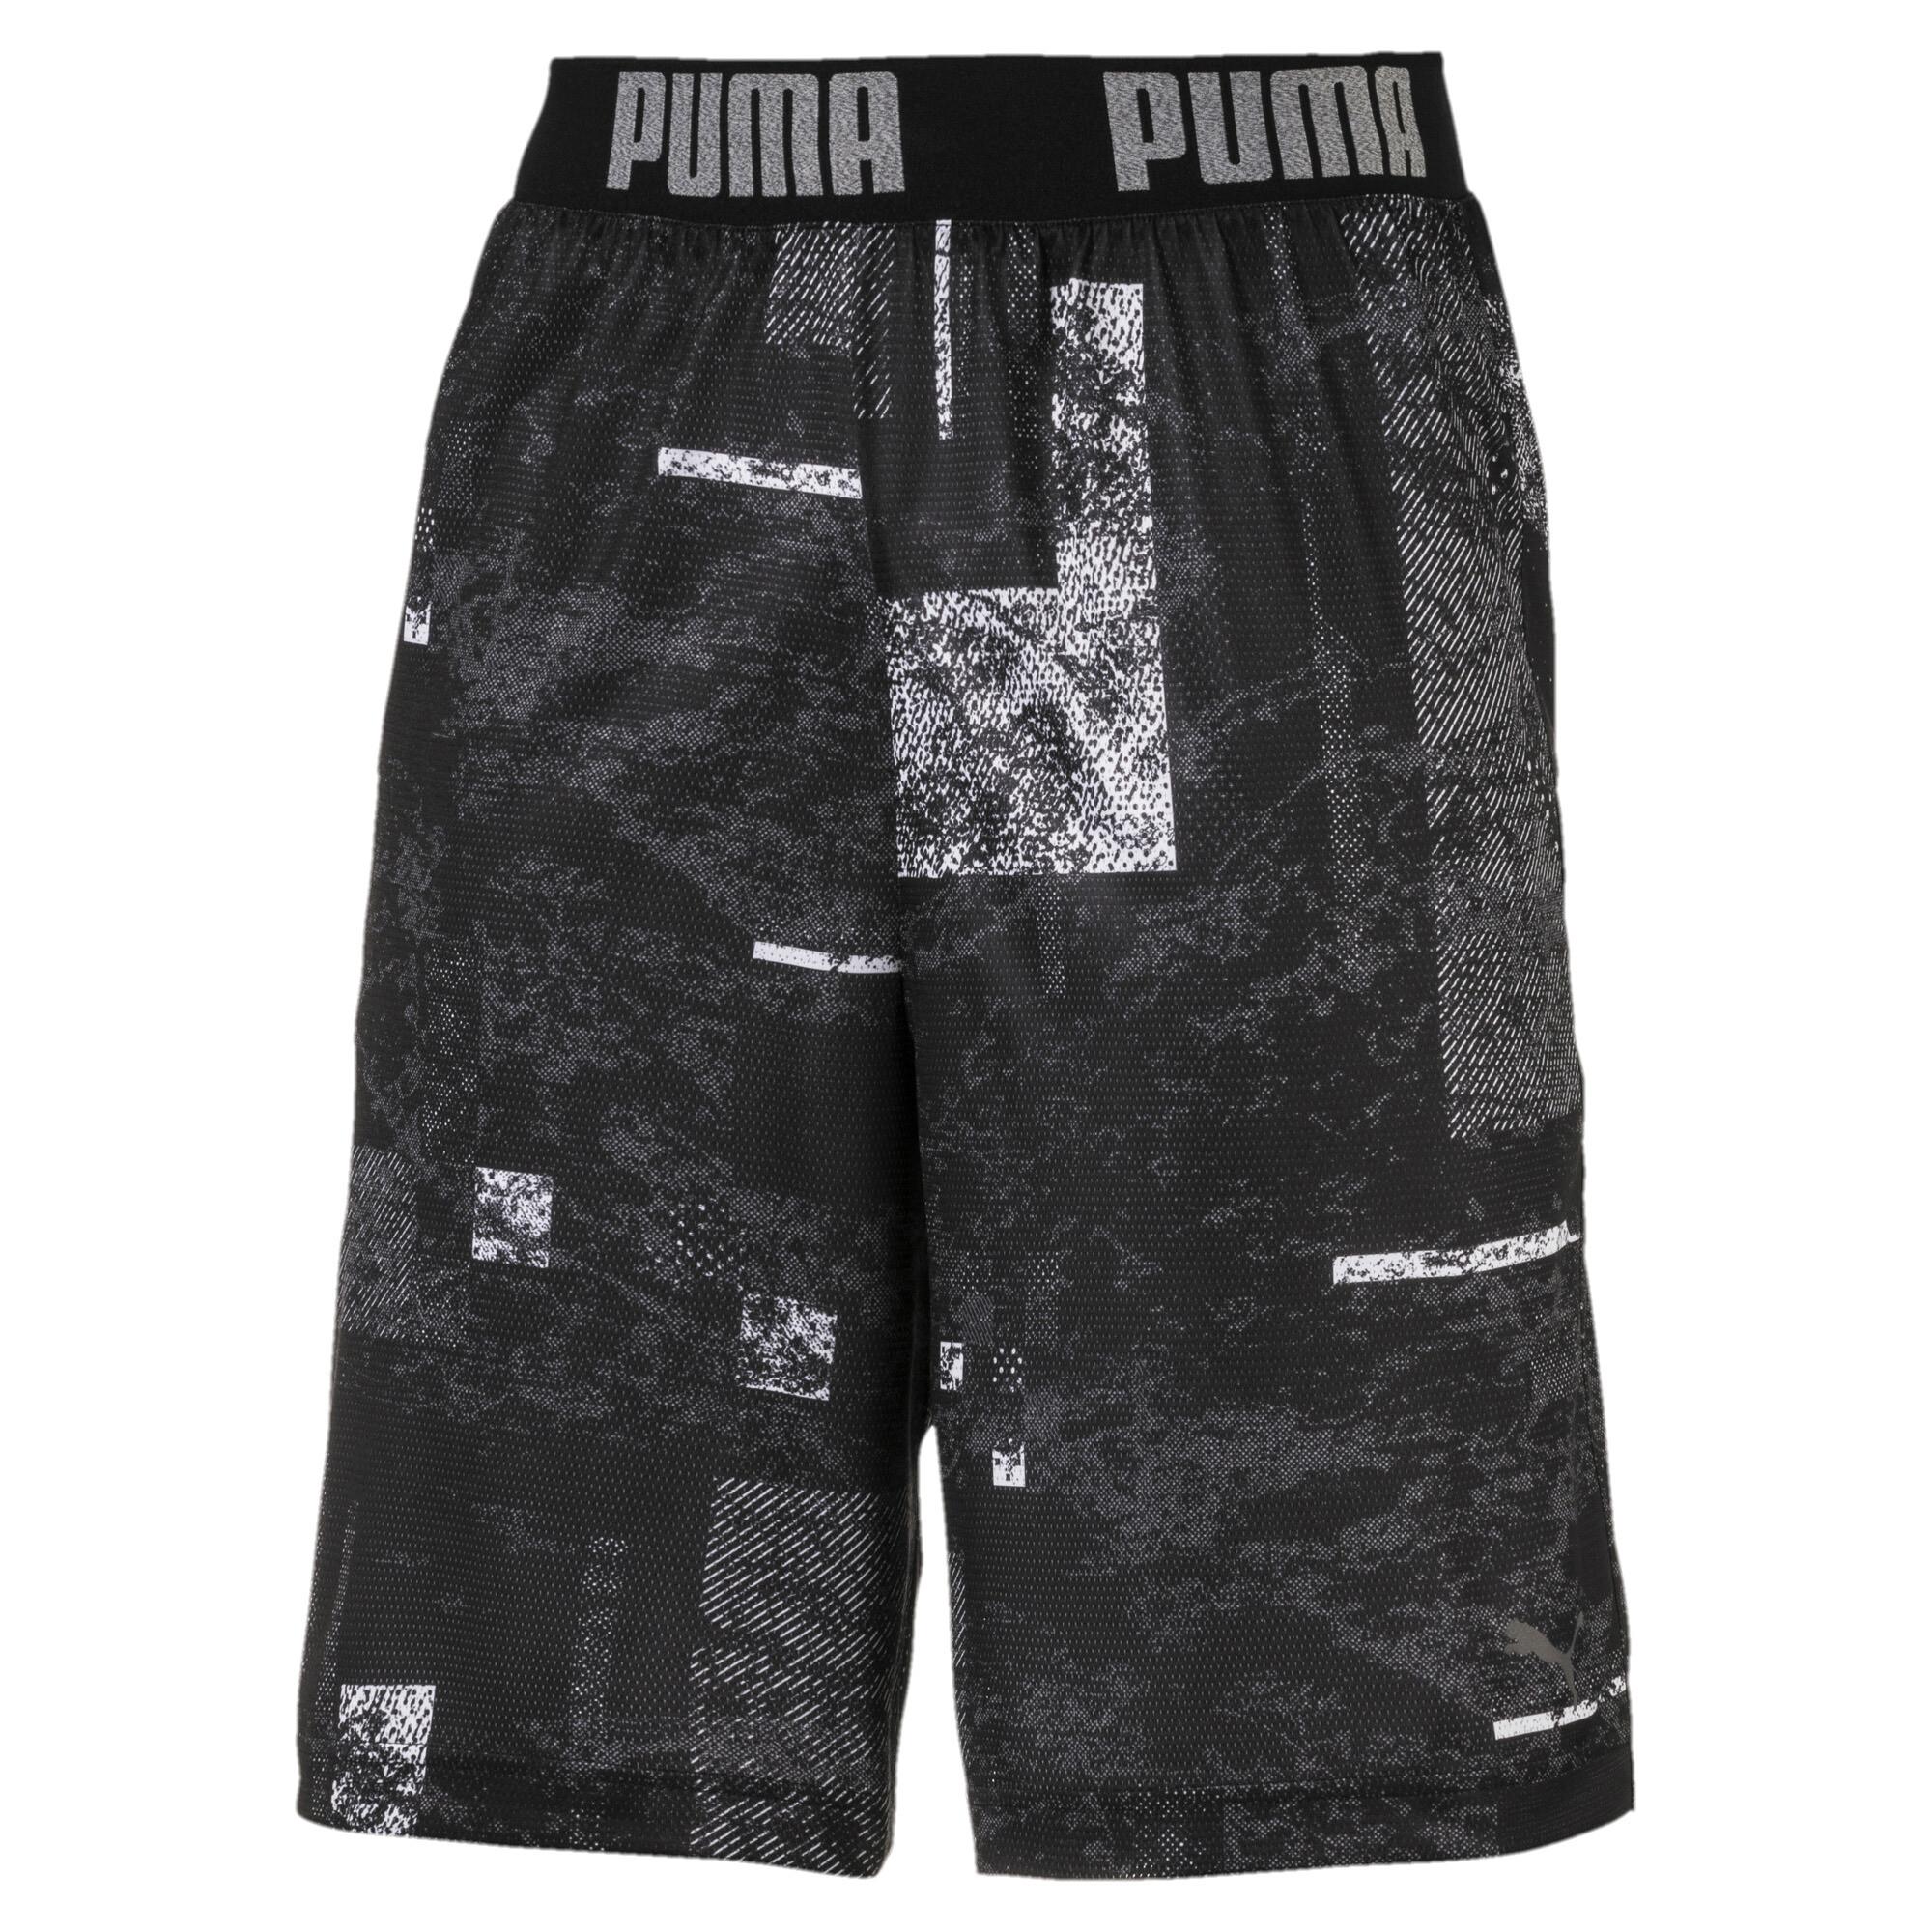 Image Puma Men's Active Training Reversible Shorts #1